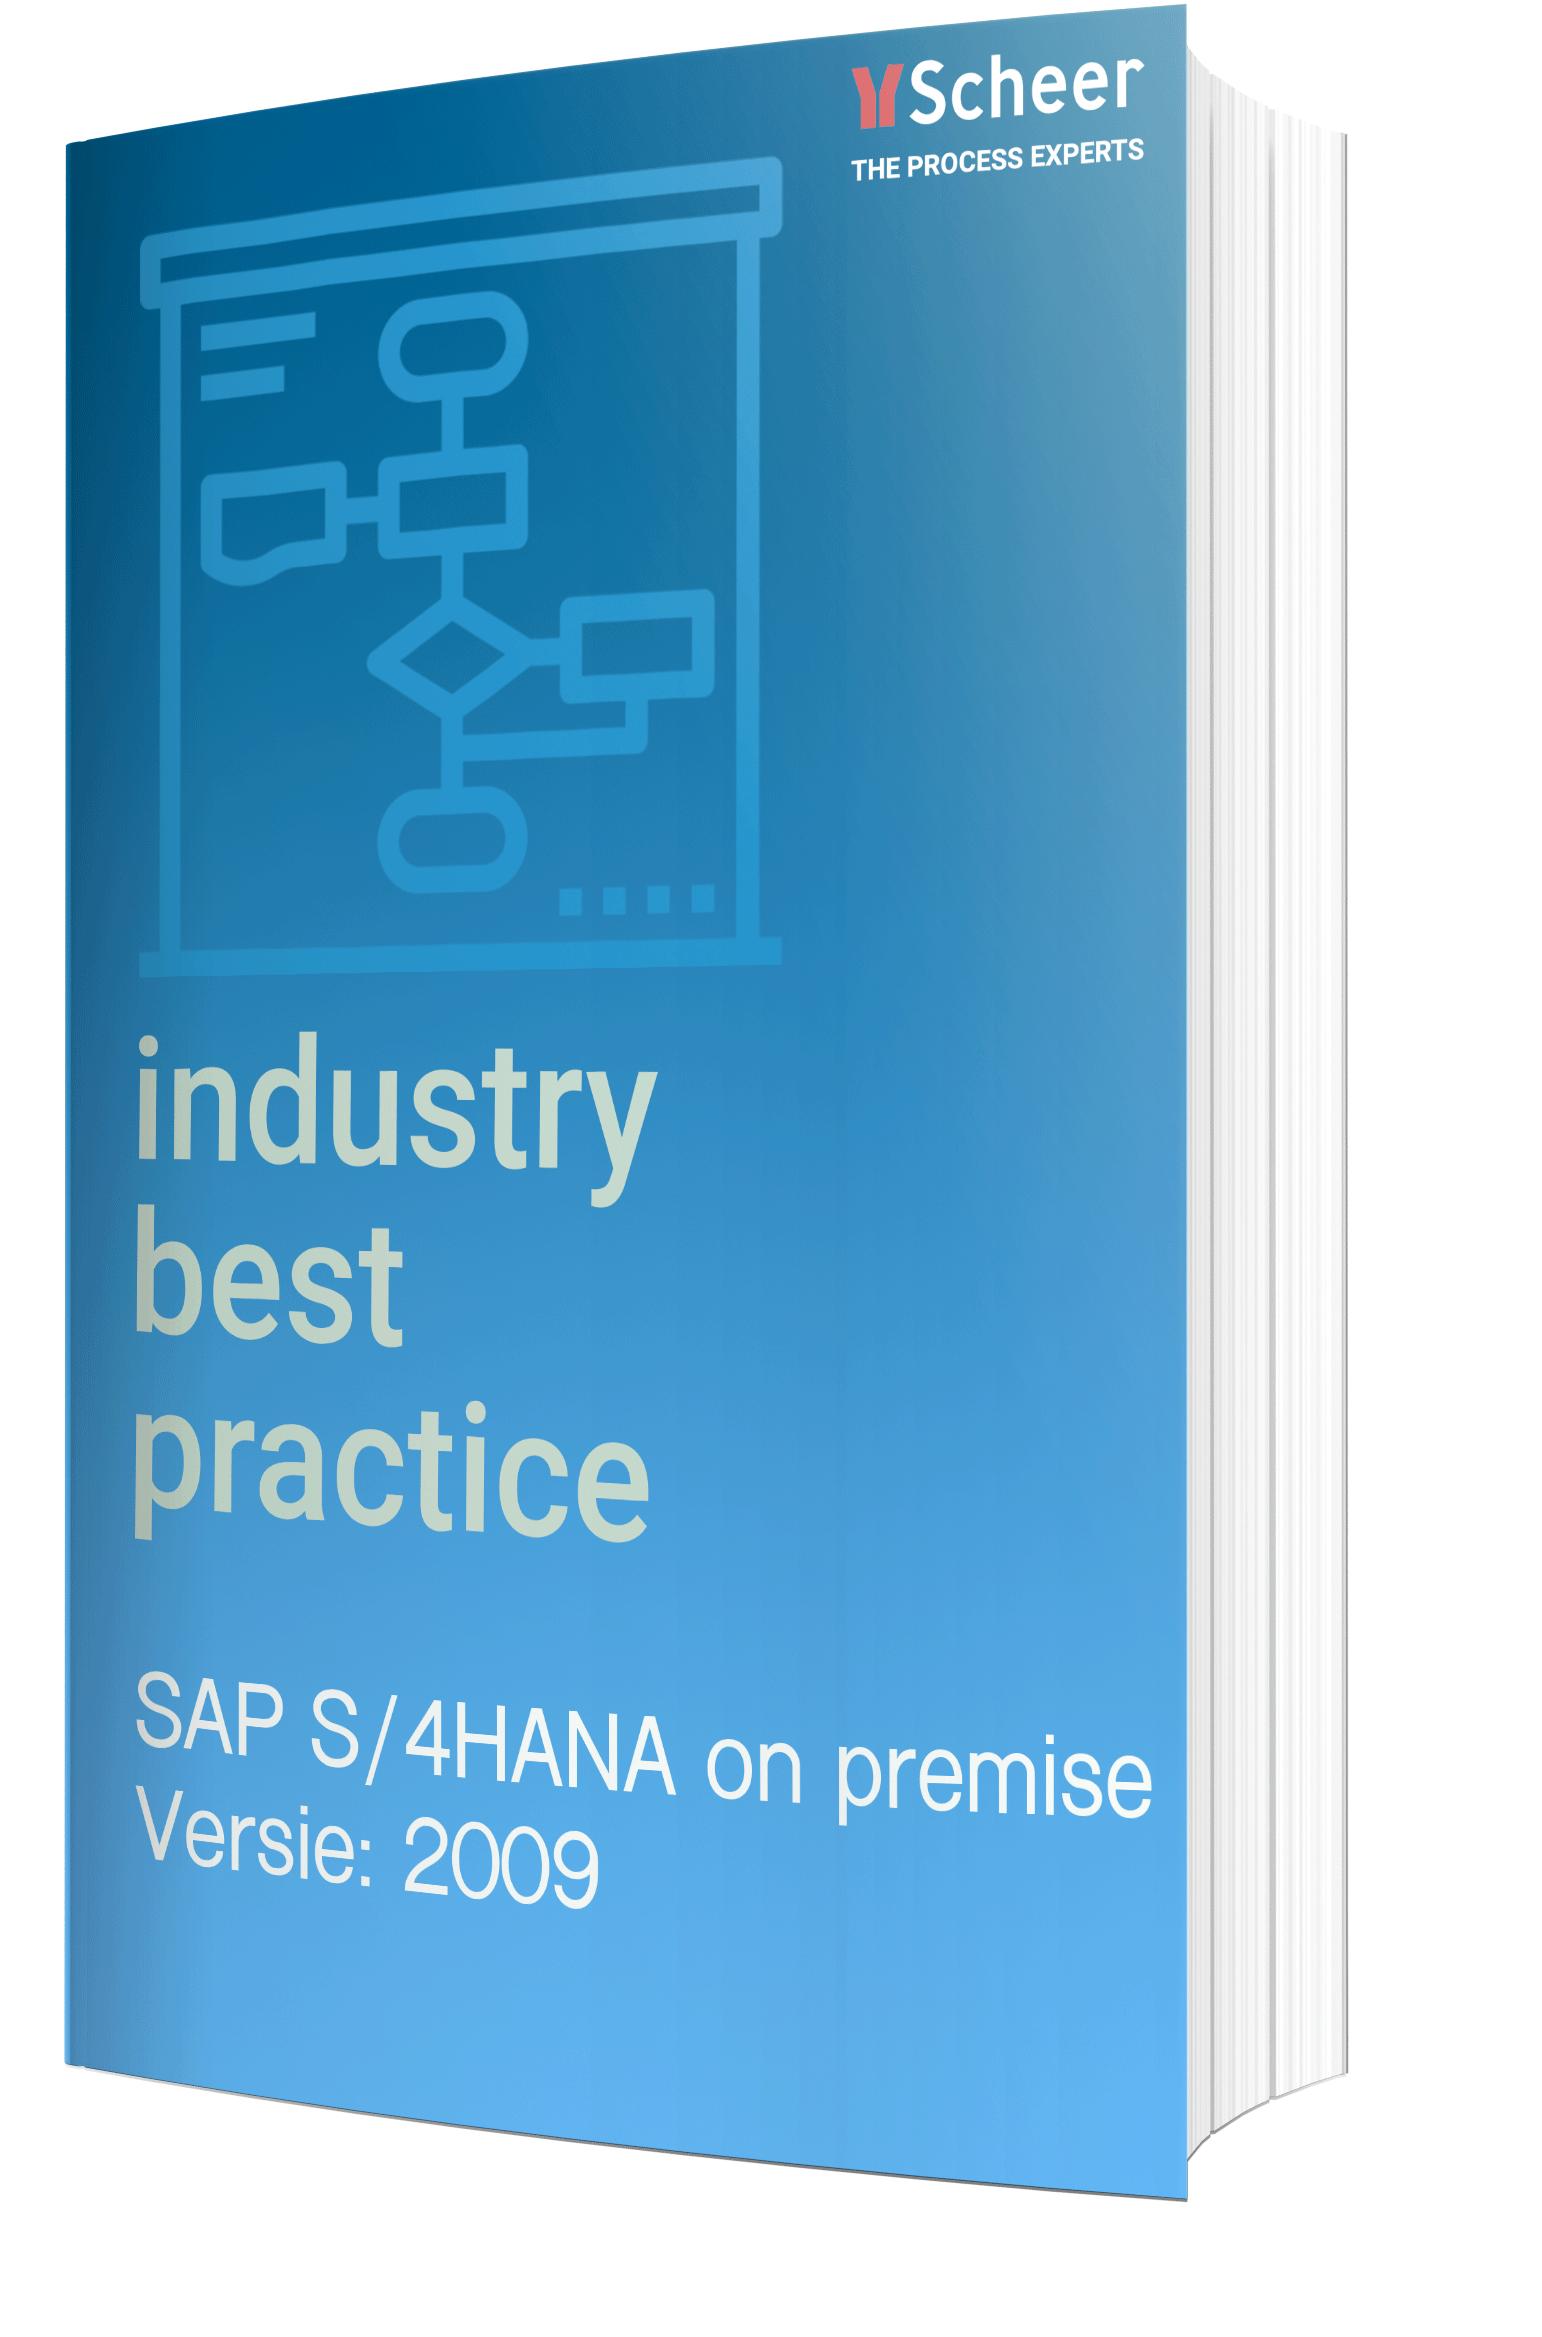 Best Practice SAP S/4HANA On Premise 2009